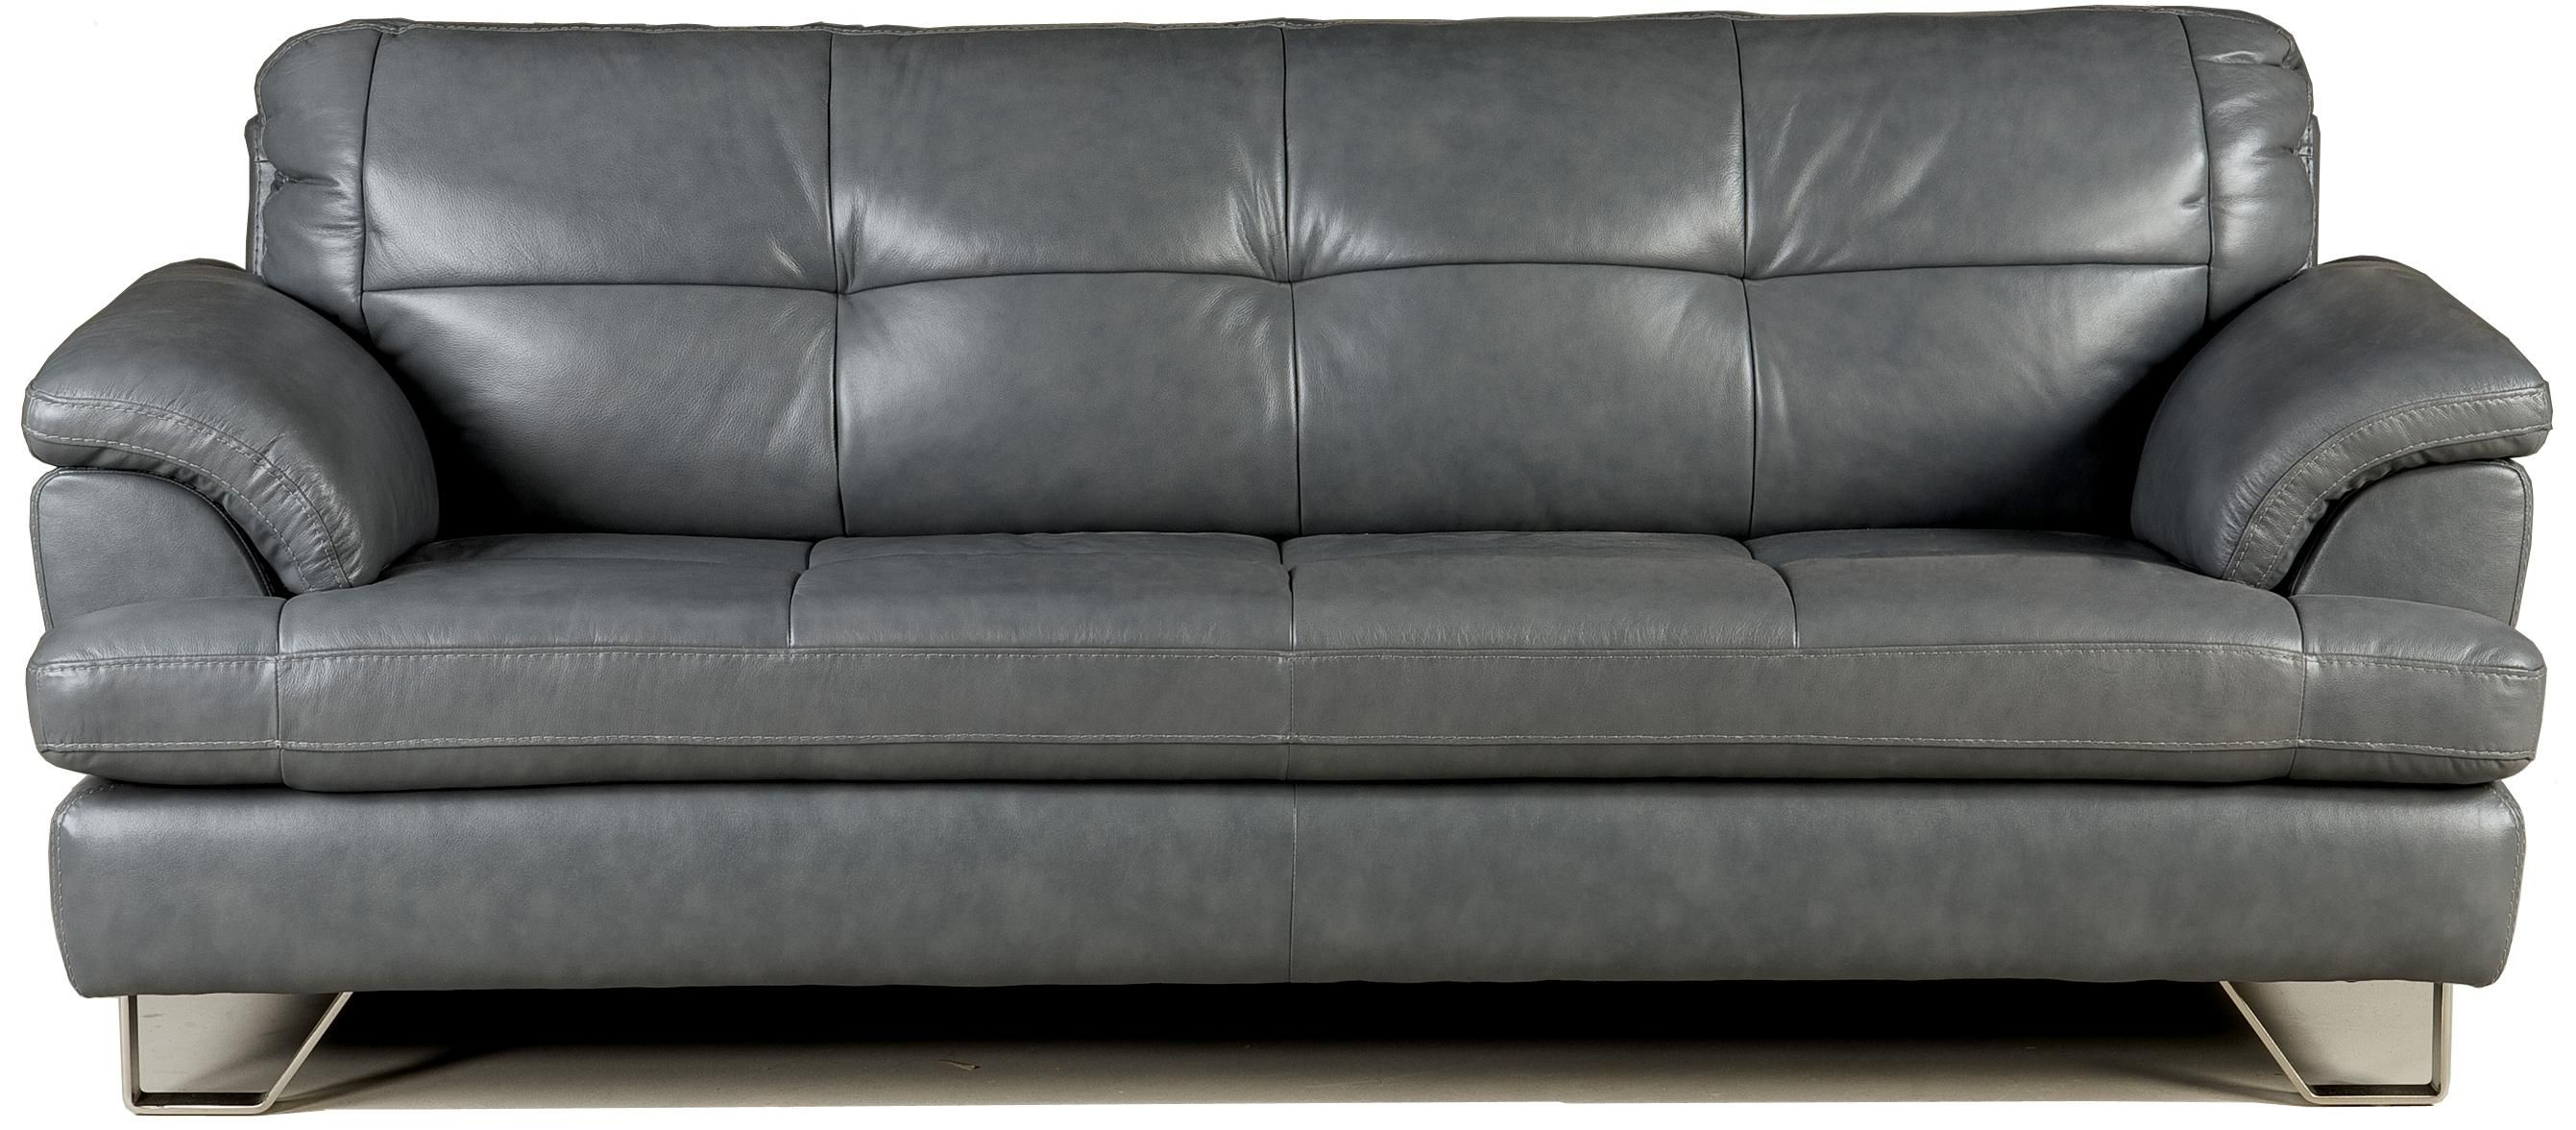 Ashley millennium gunter thunder modern sofa with tufting metal feet miskelly furniture sofa jackson mississippi